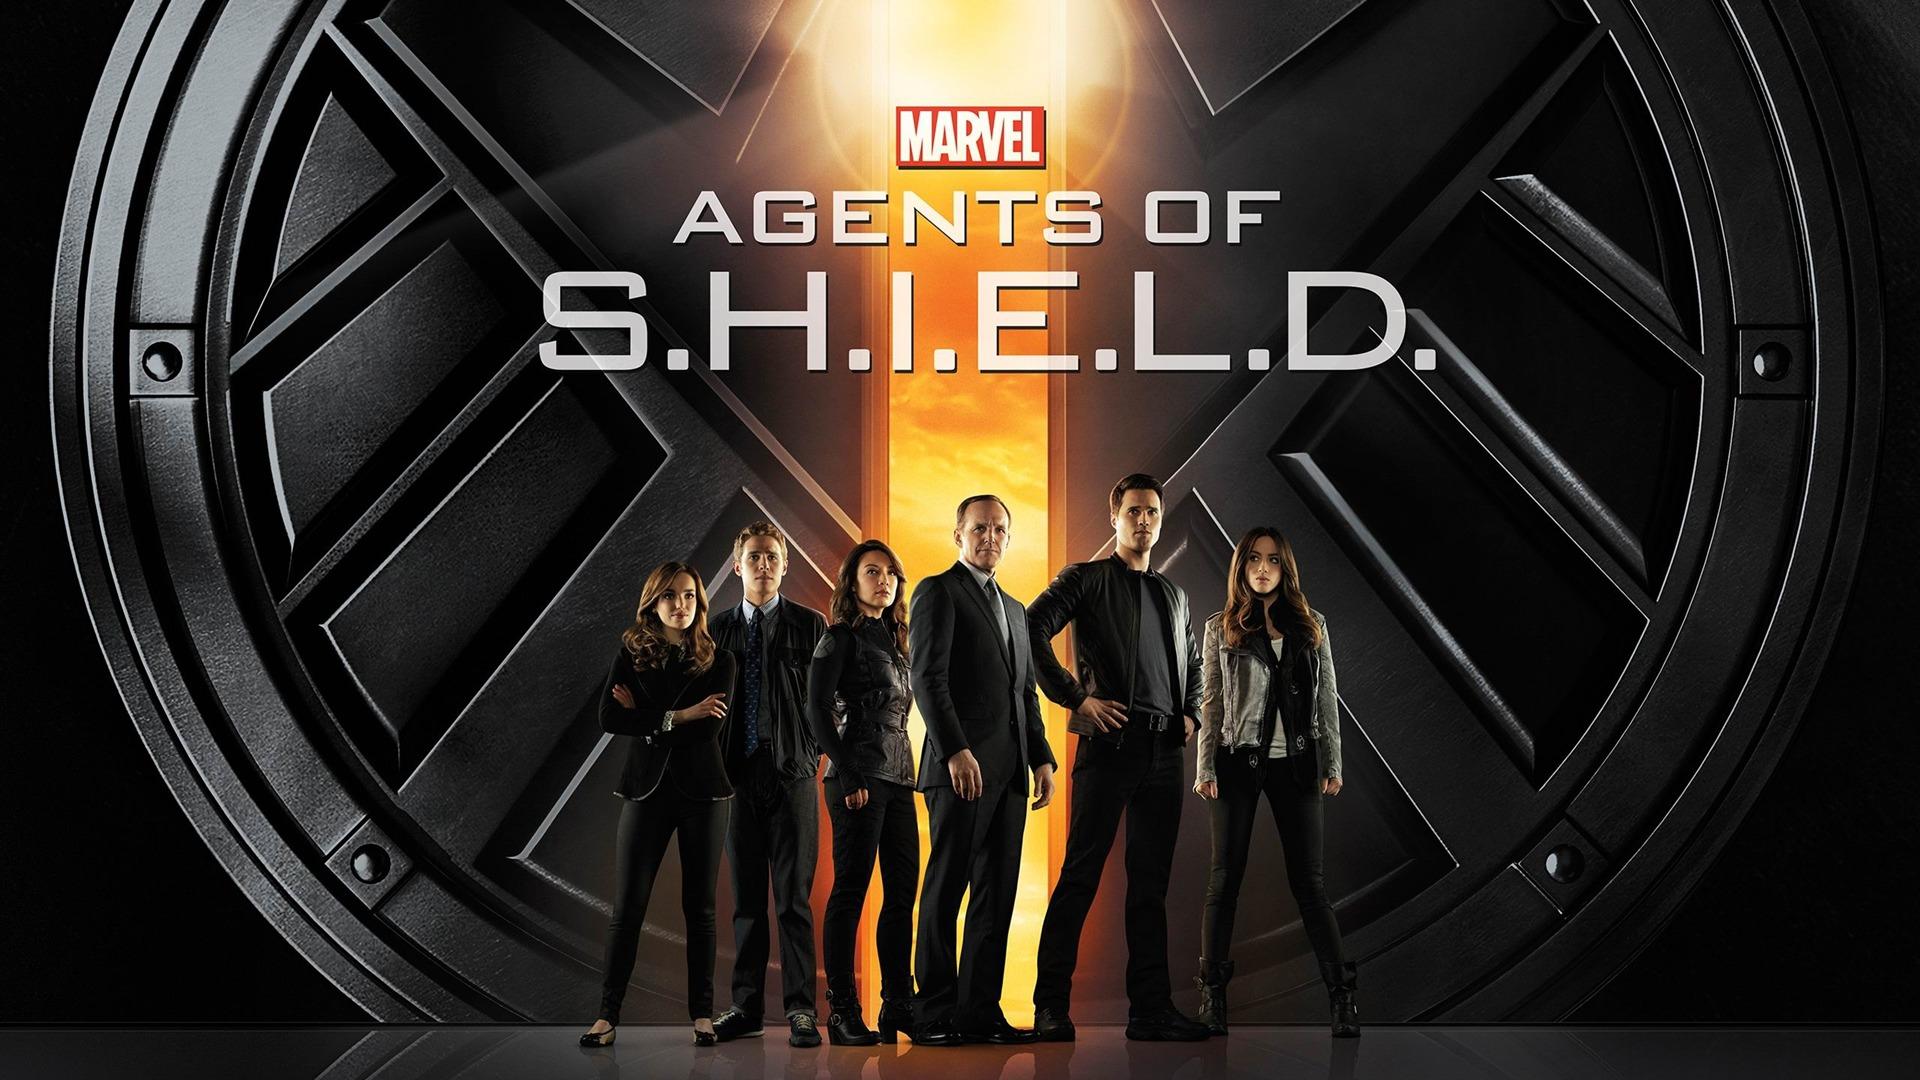 Hd wallpaper down - Agents Of Shield 1920x1080